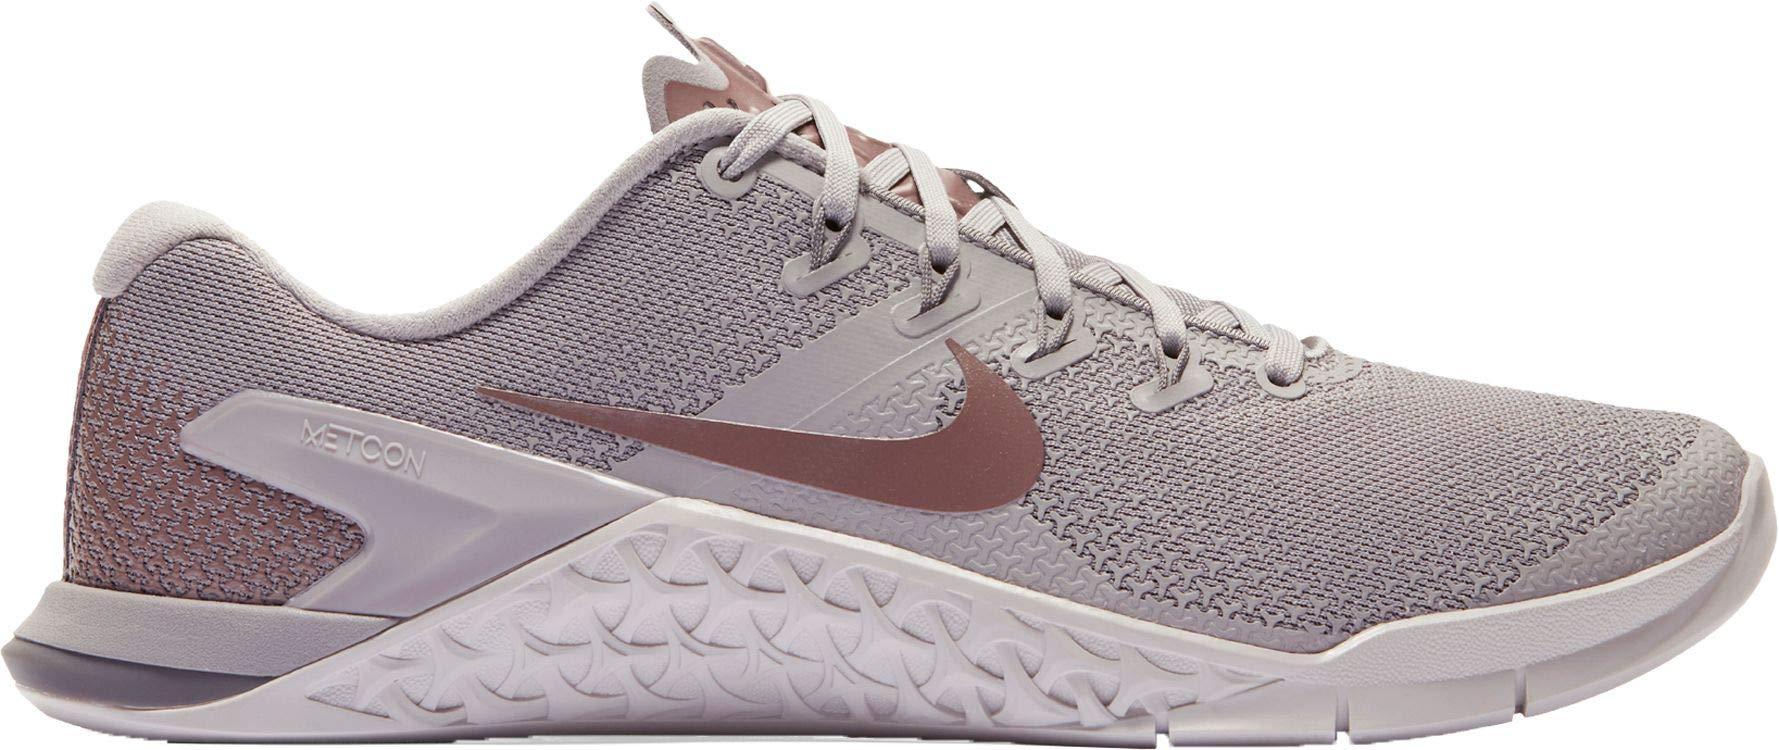 Nike Women's Metcon 4 LM Training Shoes (Grey/Mauve/MTLC, 6 M US)